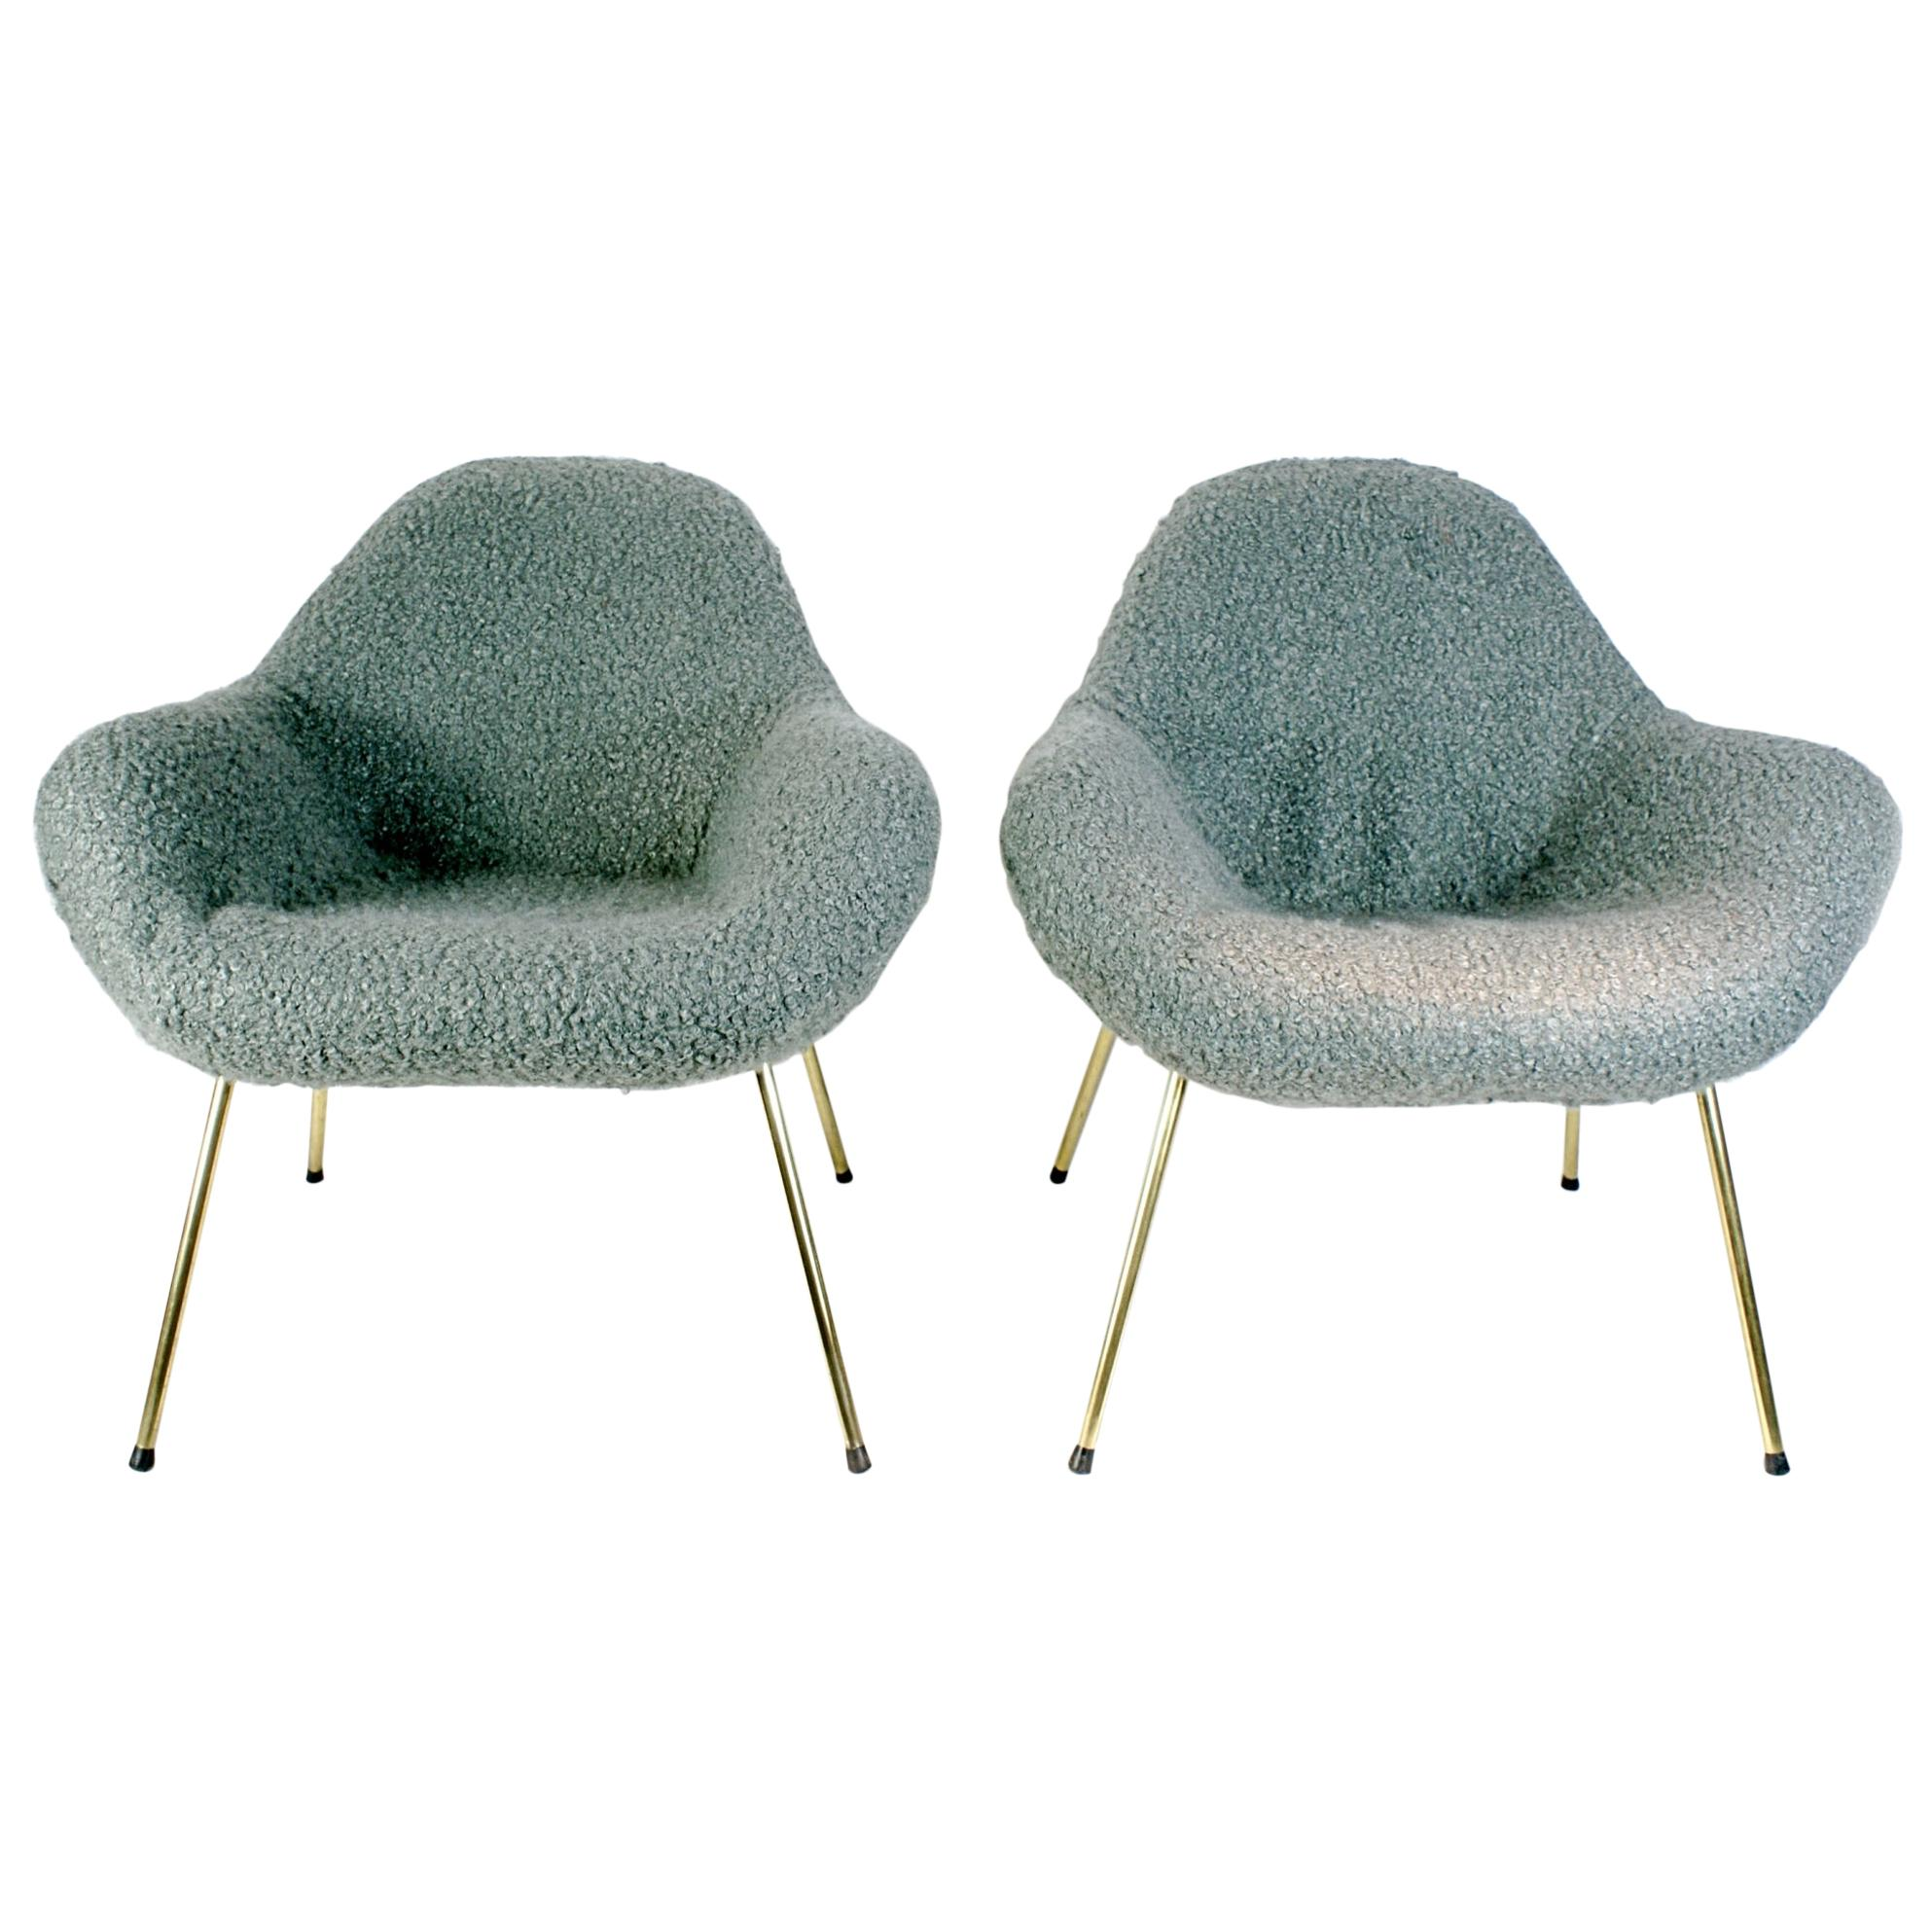 Pair of Fritz Neth Organic Midcentury Sheep Wool Lounge Chairs, 1960s, Germany